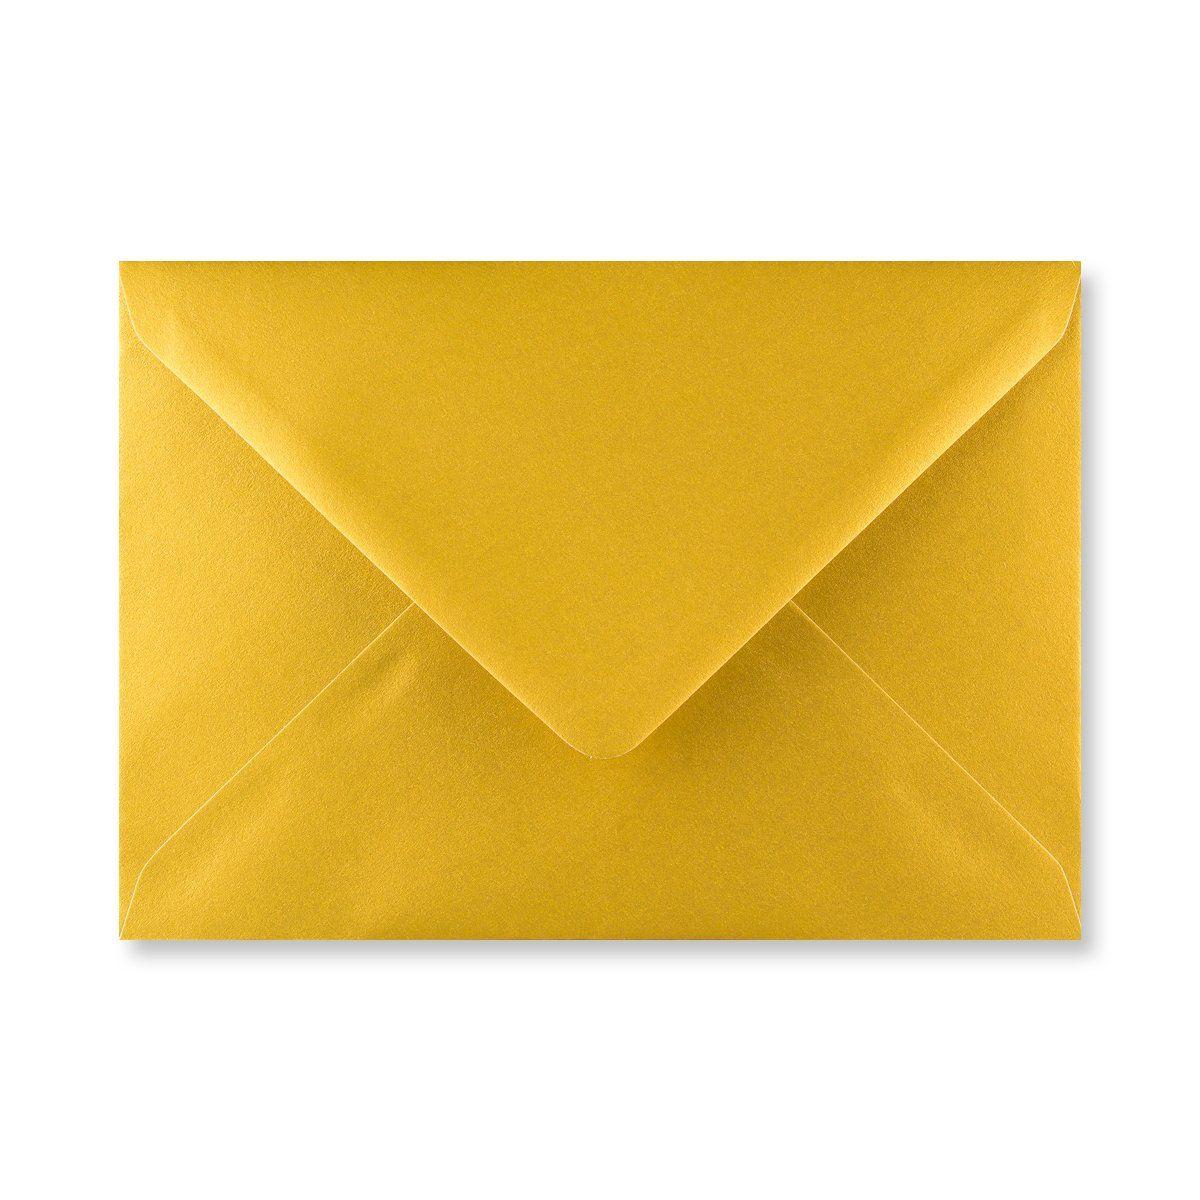 Gouden C5 enveloppen achterkant